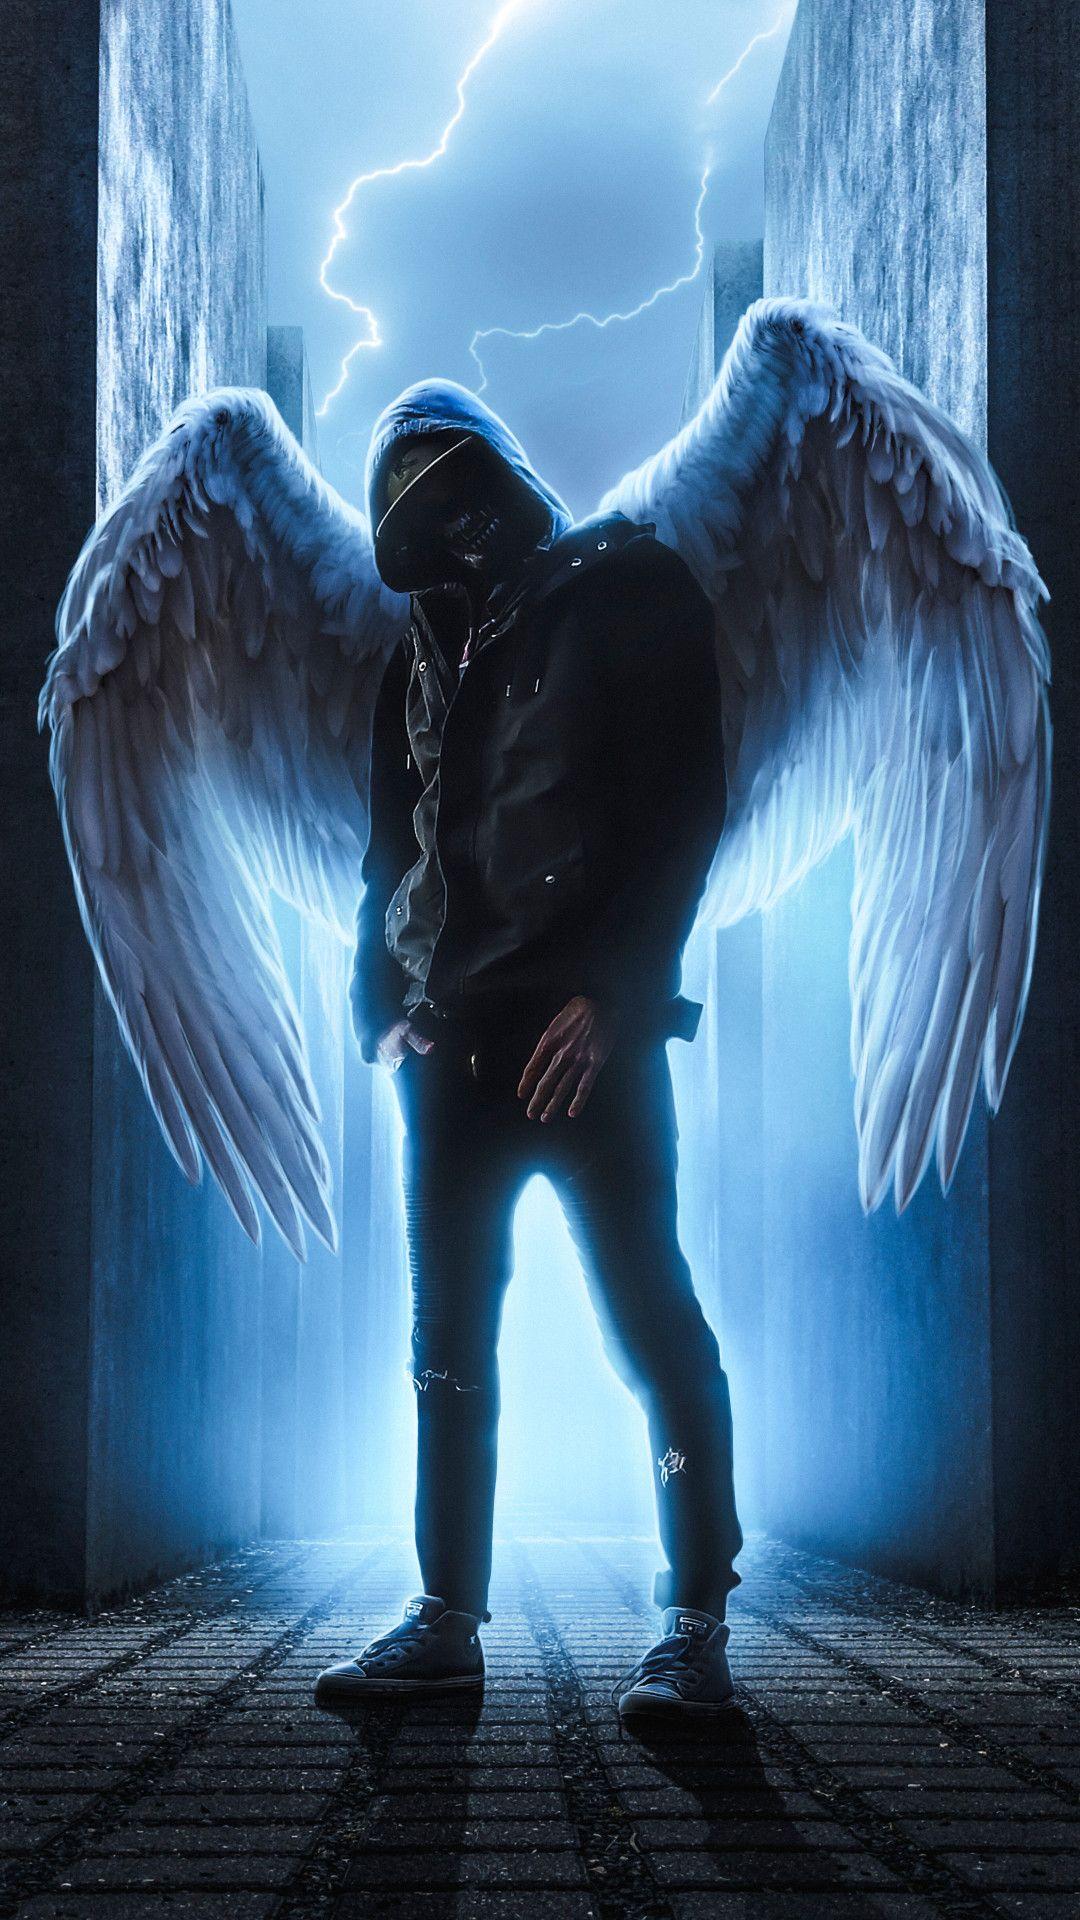 Hoodie Guy With Wings Mobile Wallpaper Iphone Android Samsung Pixel Xiaomi In 2020 Superhero Wallpaper Joker Hd Wallpaper Angel Wallpaper